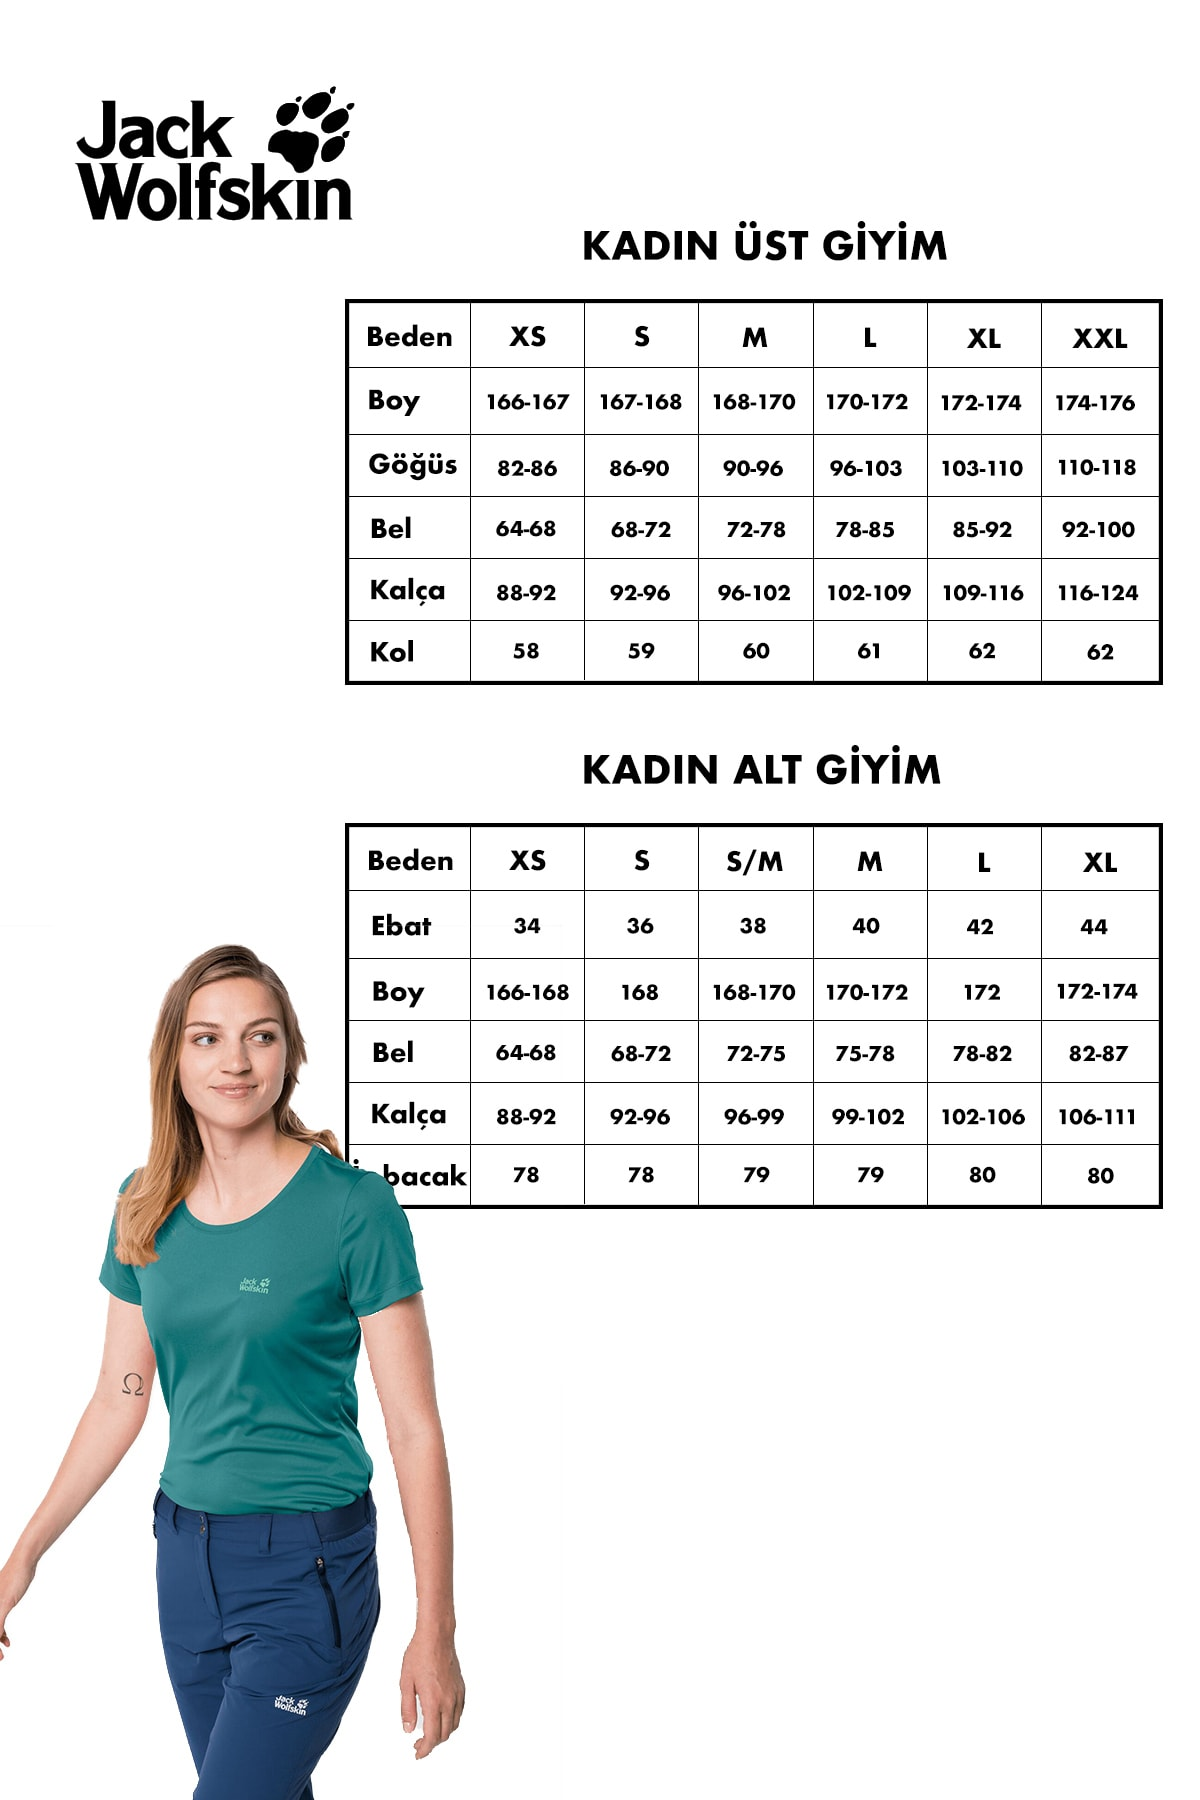 Jack Wolfskin Crosstrail Kadın T-shirt - 1801692-1145 2